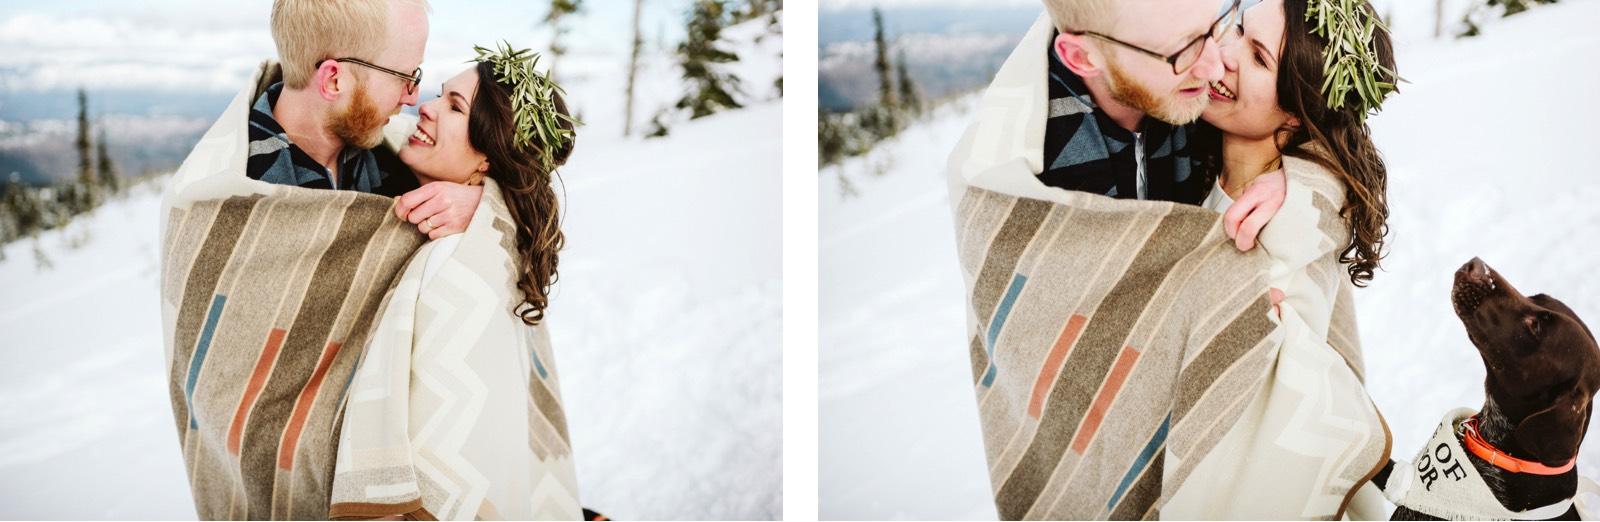 alpine-lakes-high-camp-winter-wedding-54 ALPINE LAKES HIGH CAMP WEDDING